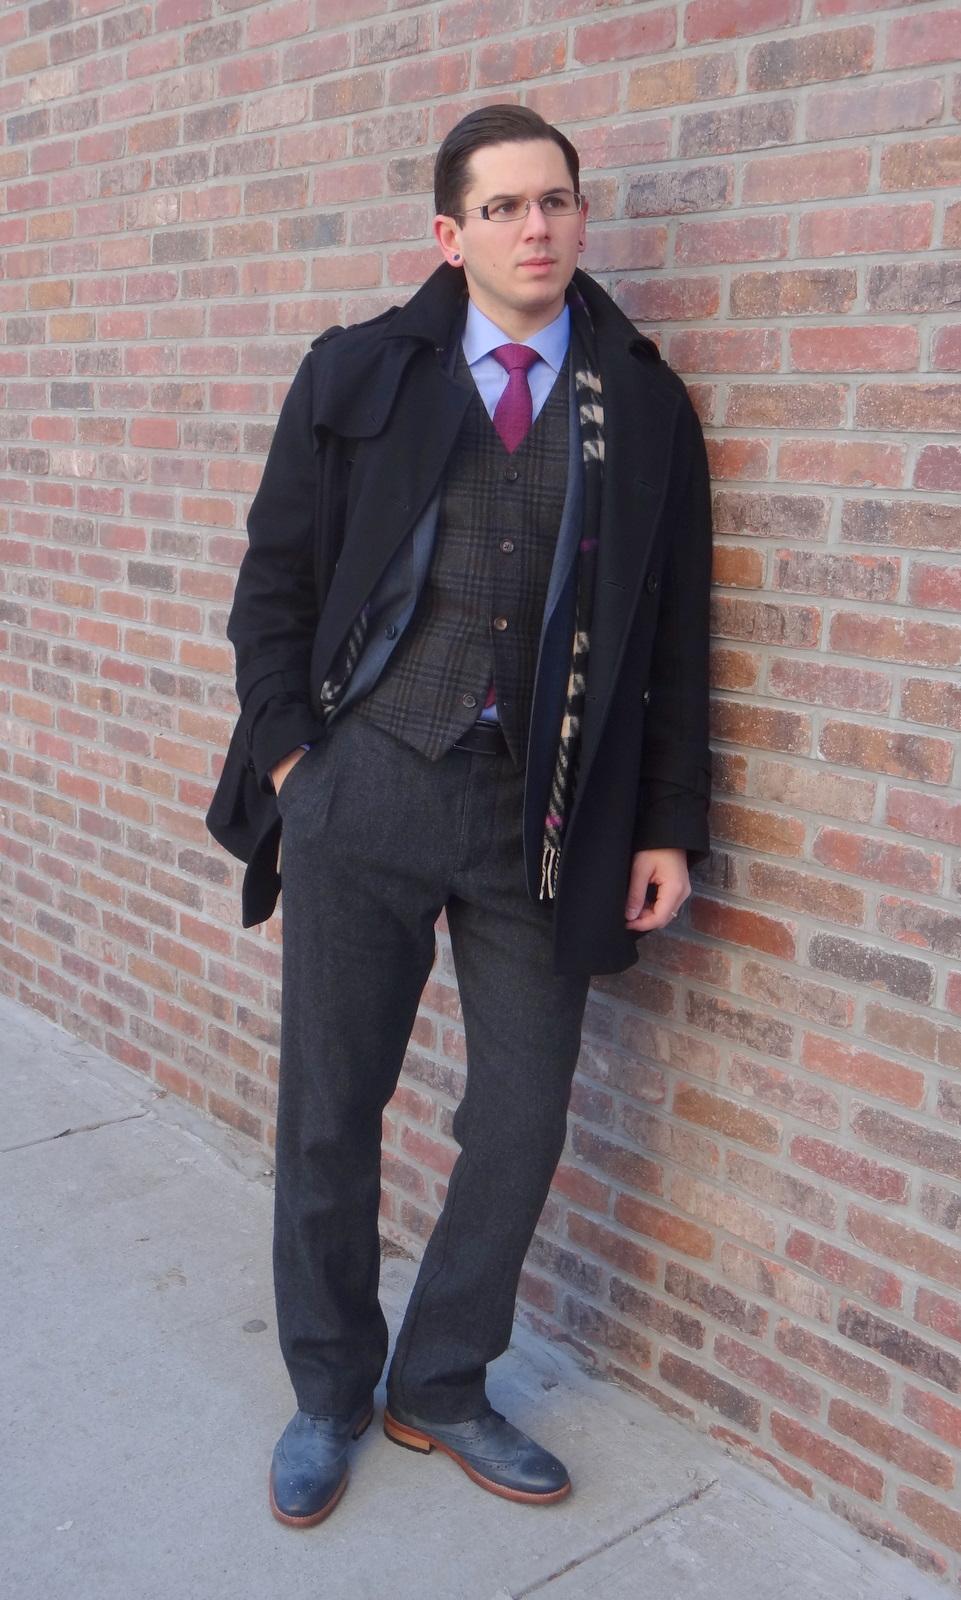 cc5bc8a4ec The Shy Stylist - a men s style blog  December 2011